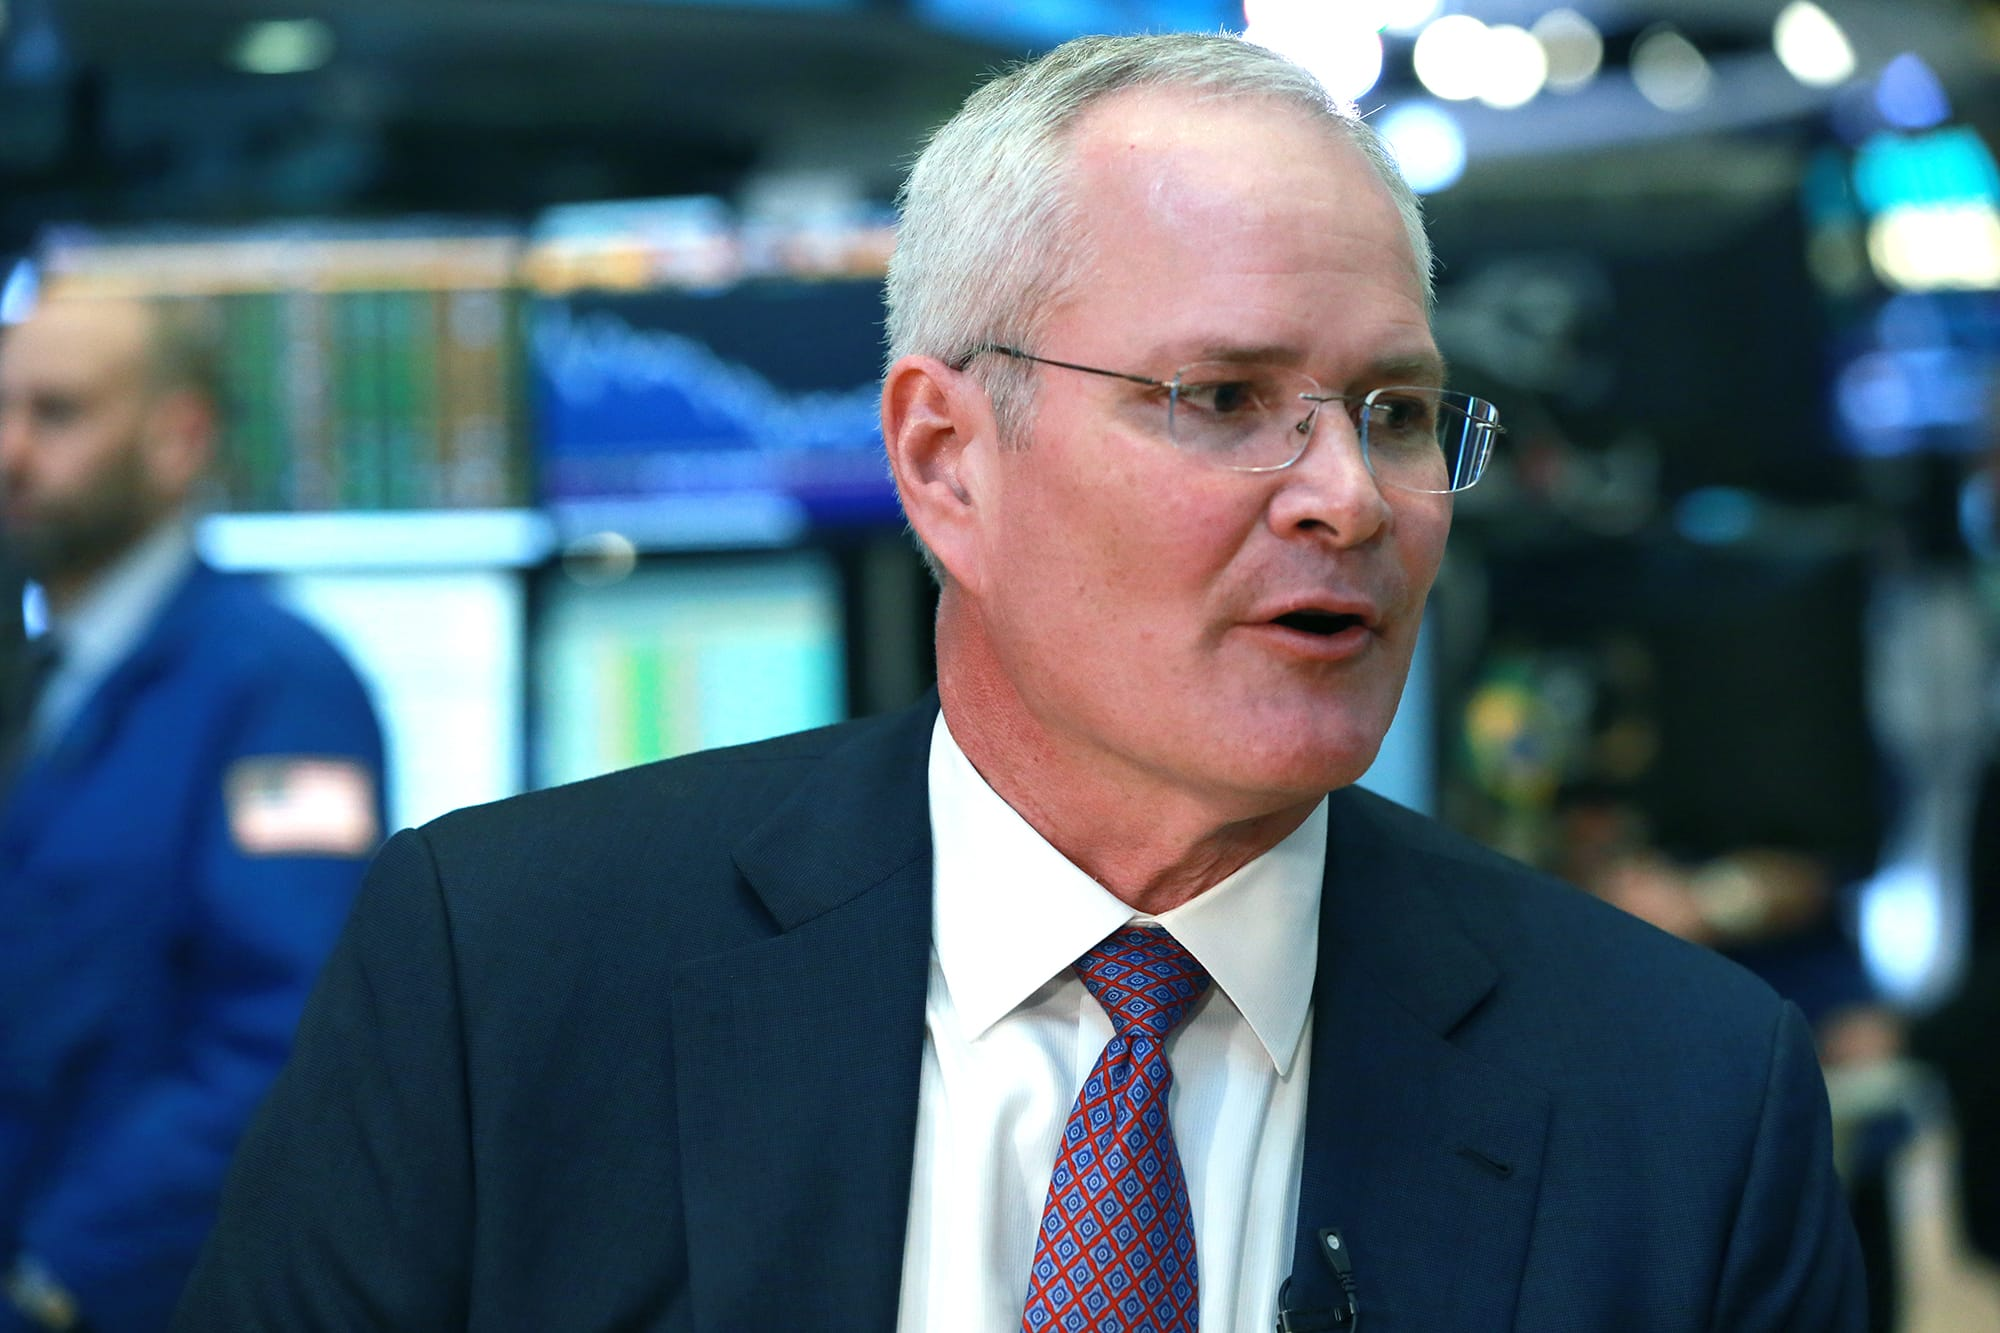 CNBC: Darren Woods, Exxon Mobil CEO 170301-004